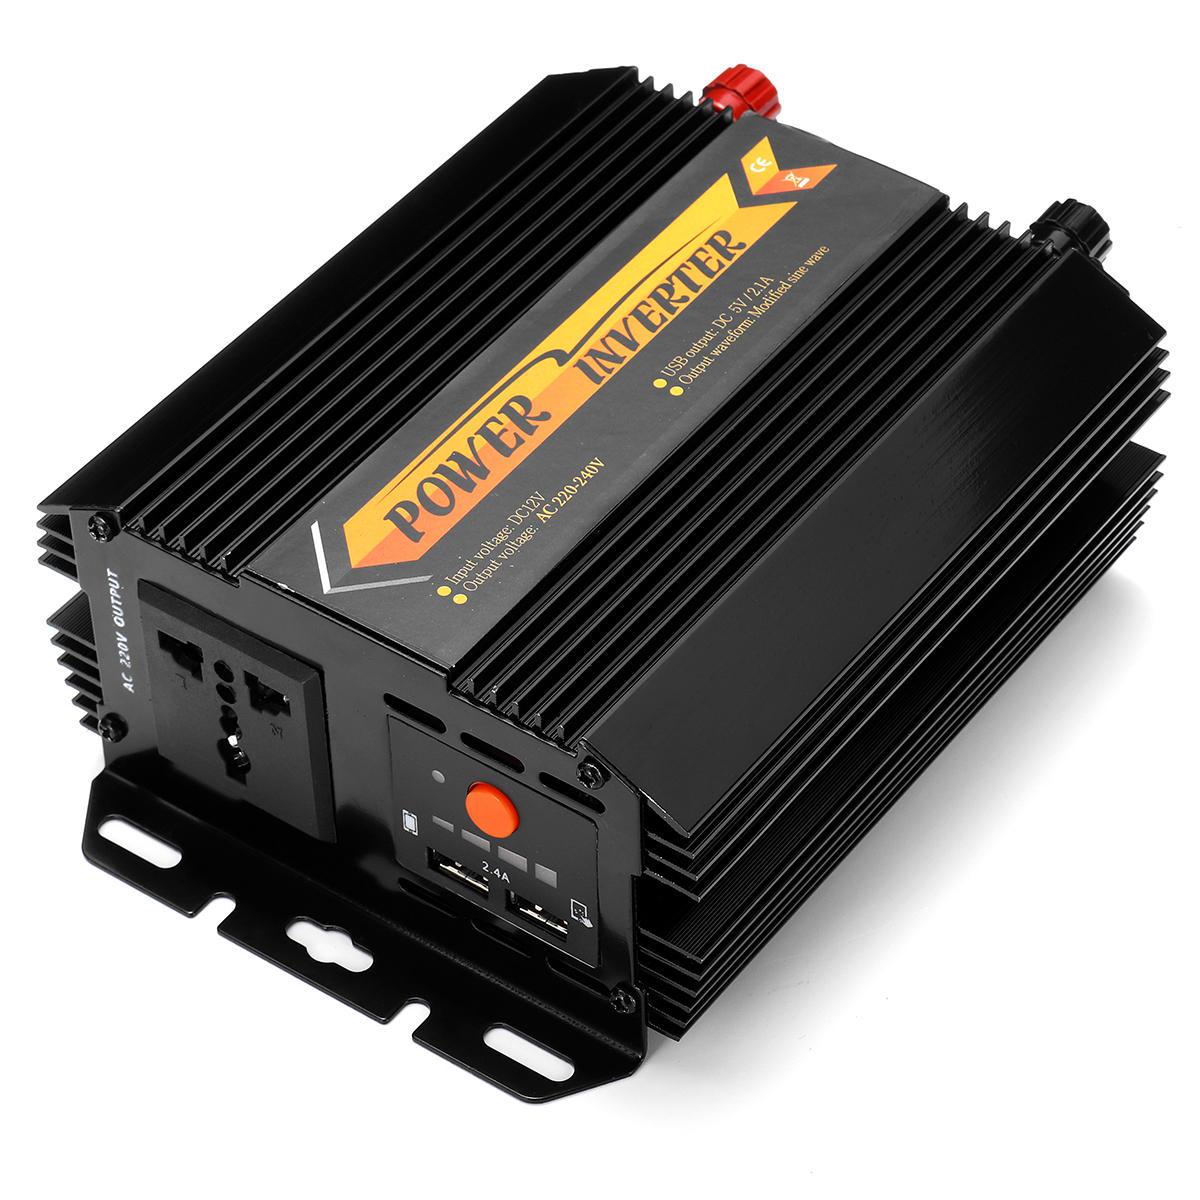 600W Peak Power Inverter 12V/24V To 220V-240V Digital Modified Sine Wave Converter